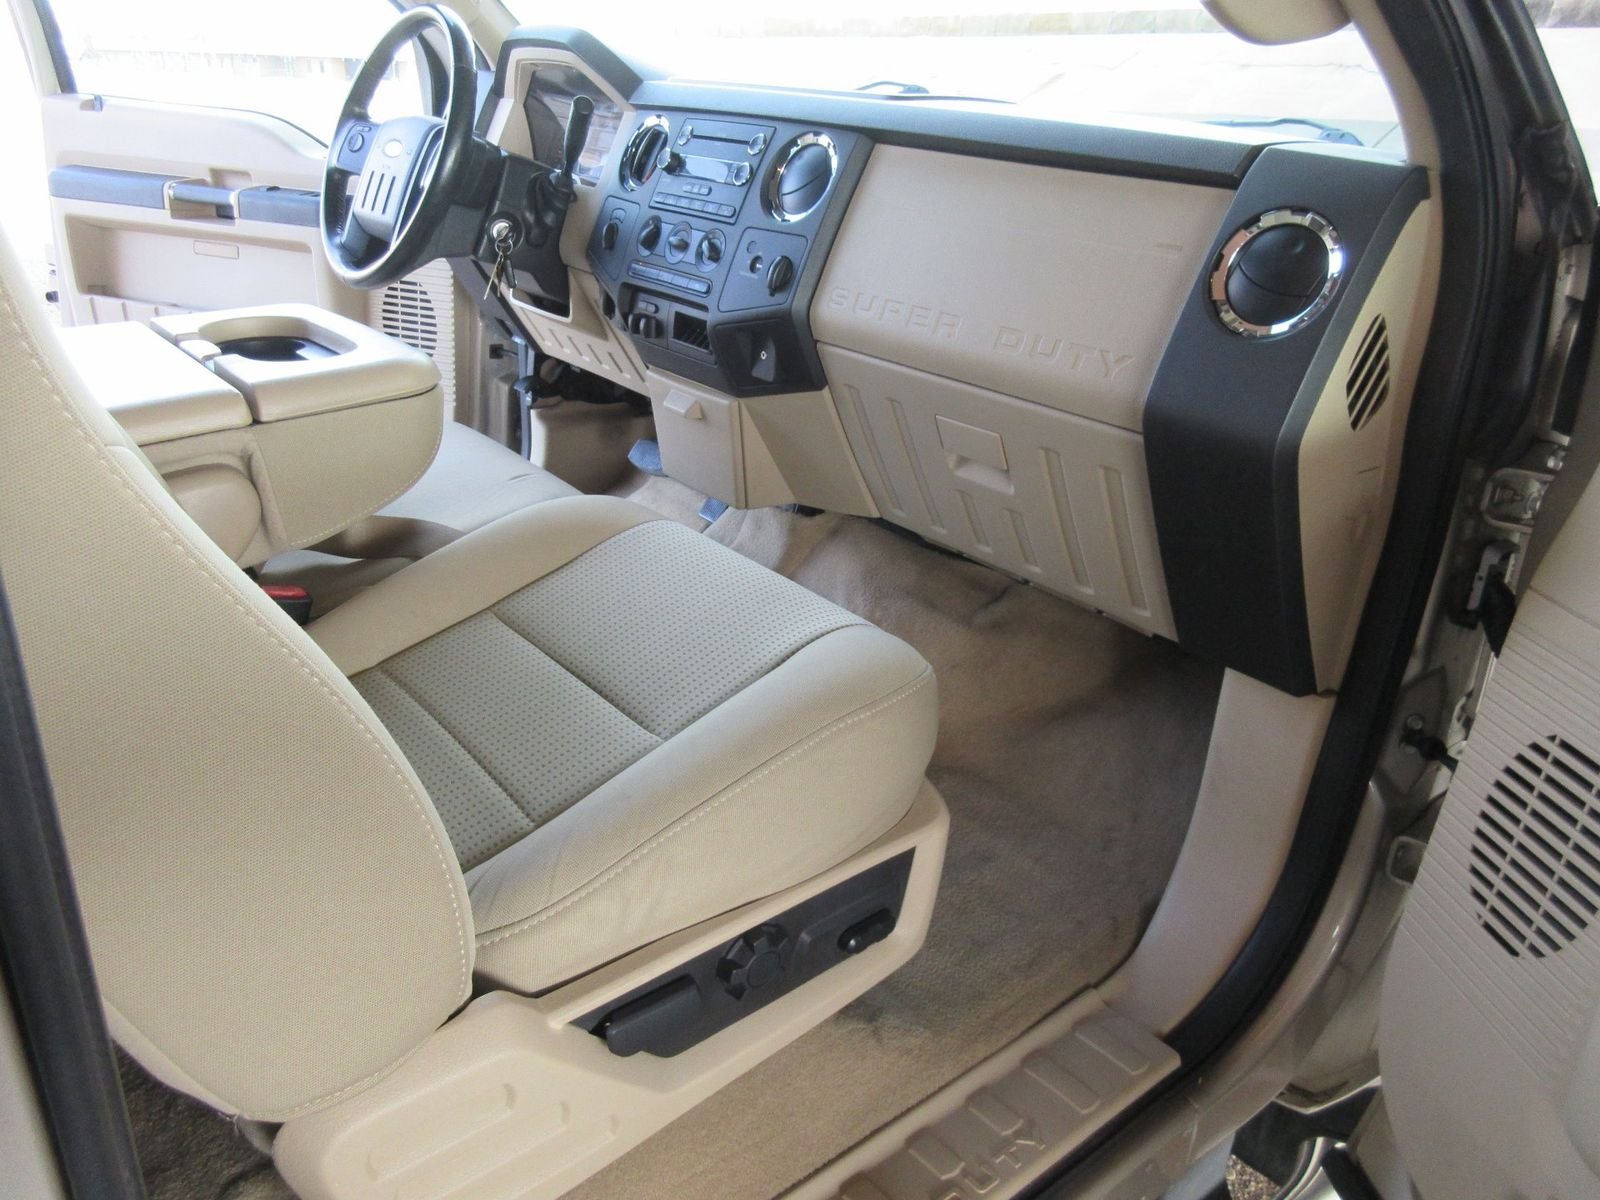 2009 Ford Super Duty F 250 Srw 4x4 Xlt W Cm Flatbed Fultons Used 6 Pin Wiring Harness Cars